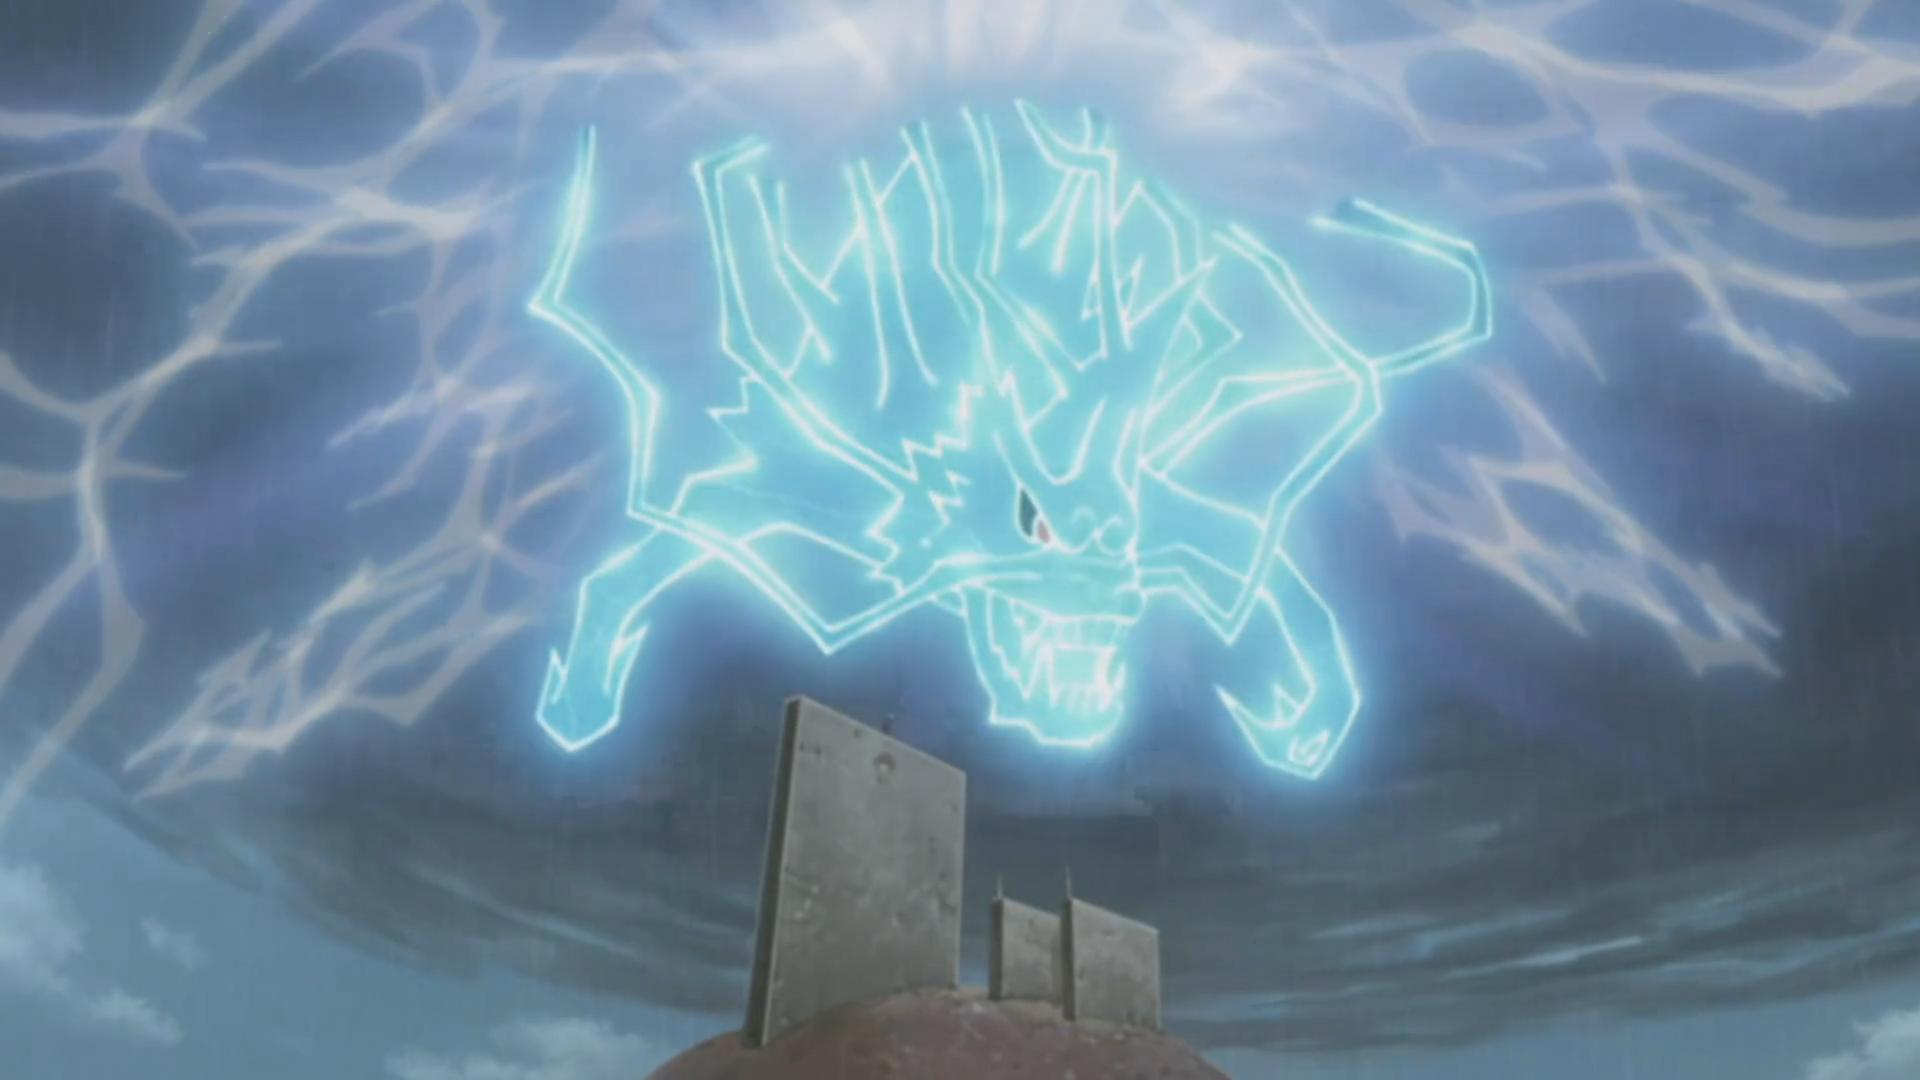 Kirin | Narutopedia | FANDOM powered by Wikia